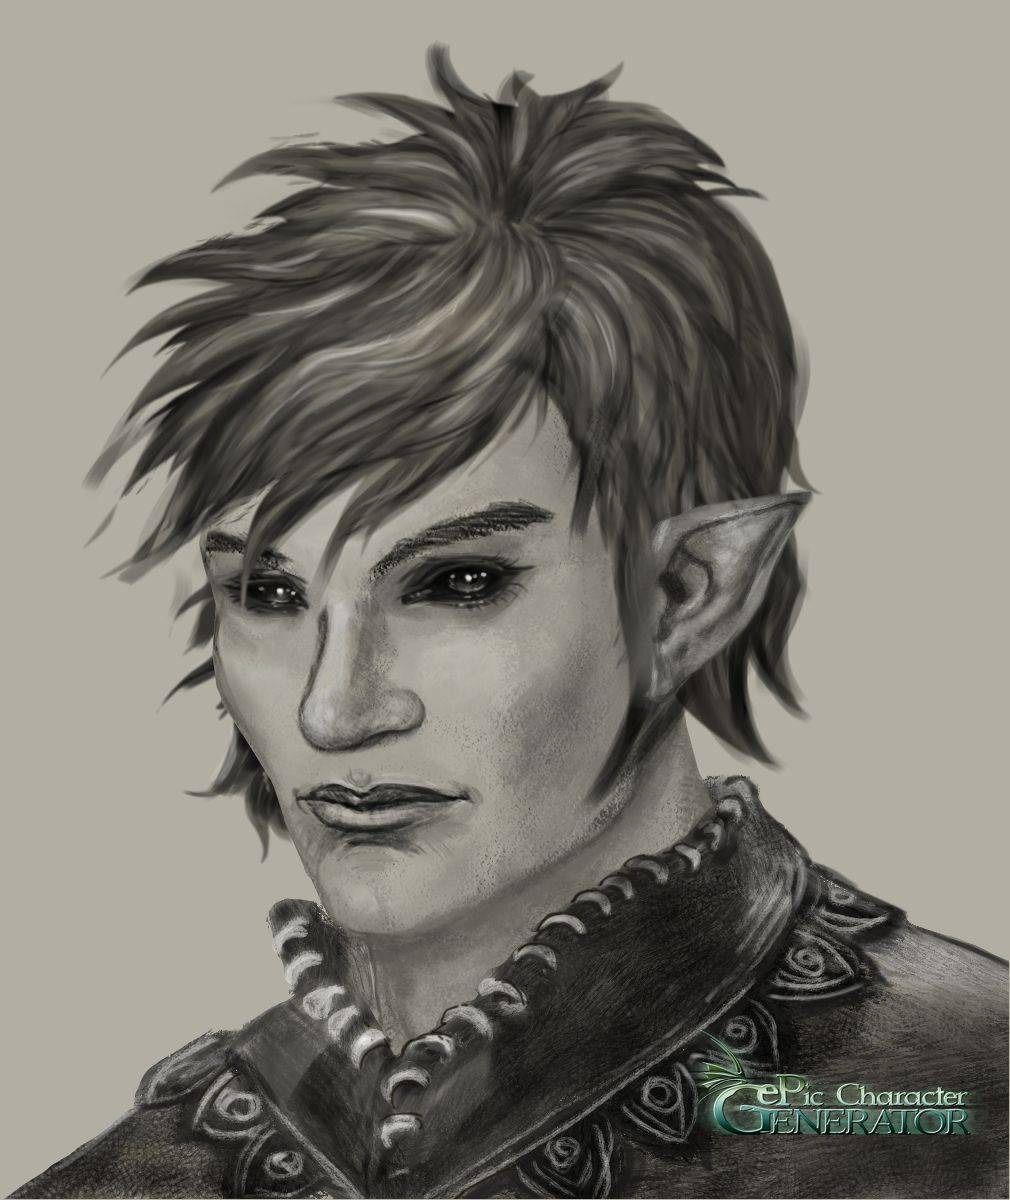 ePic Character Generator Season 3 Male Portrait Screenshot 10